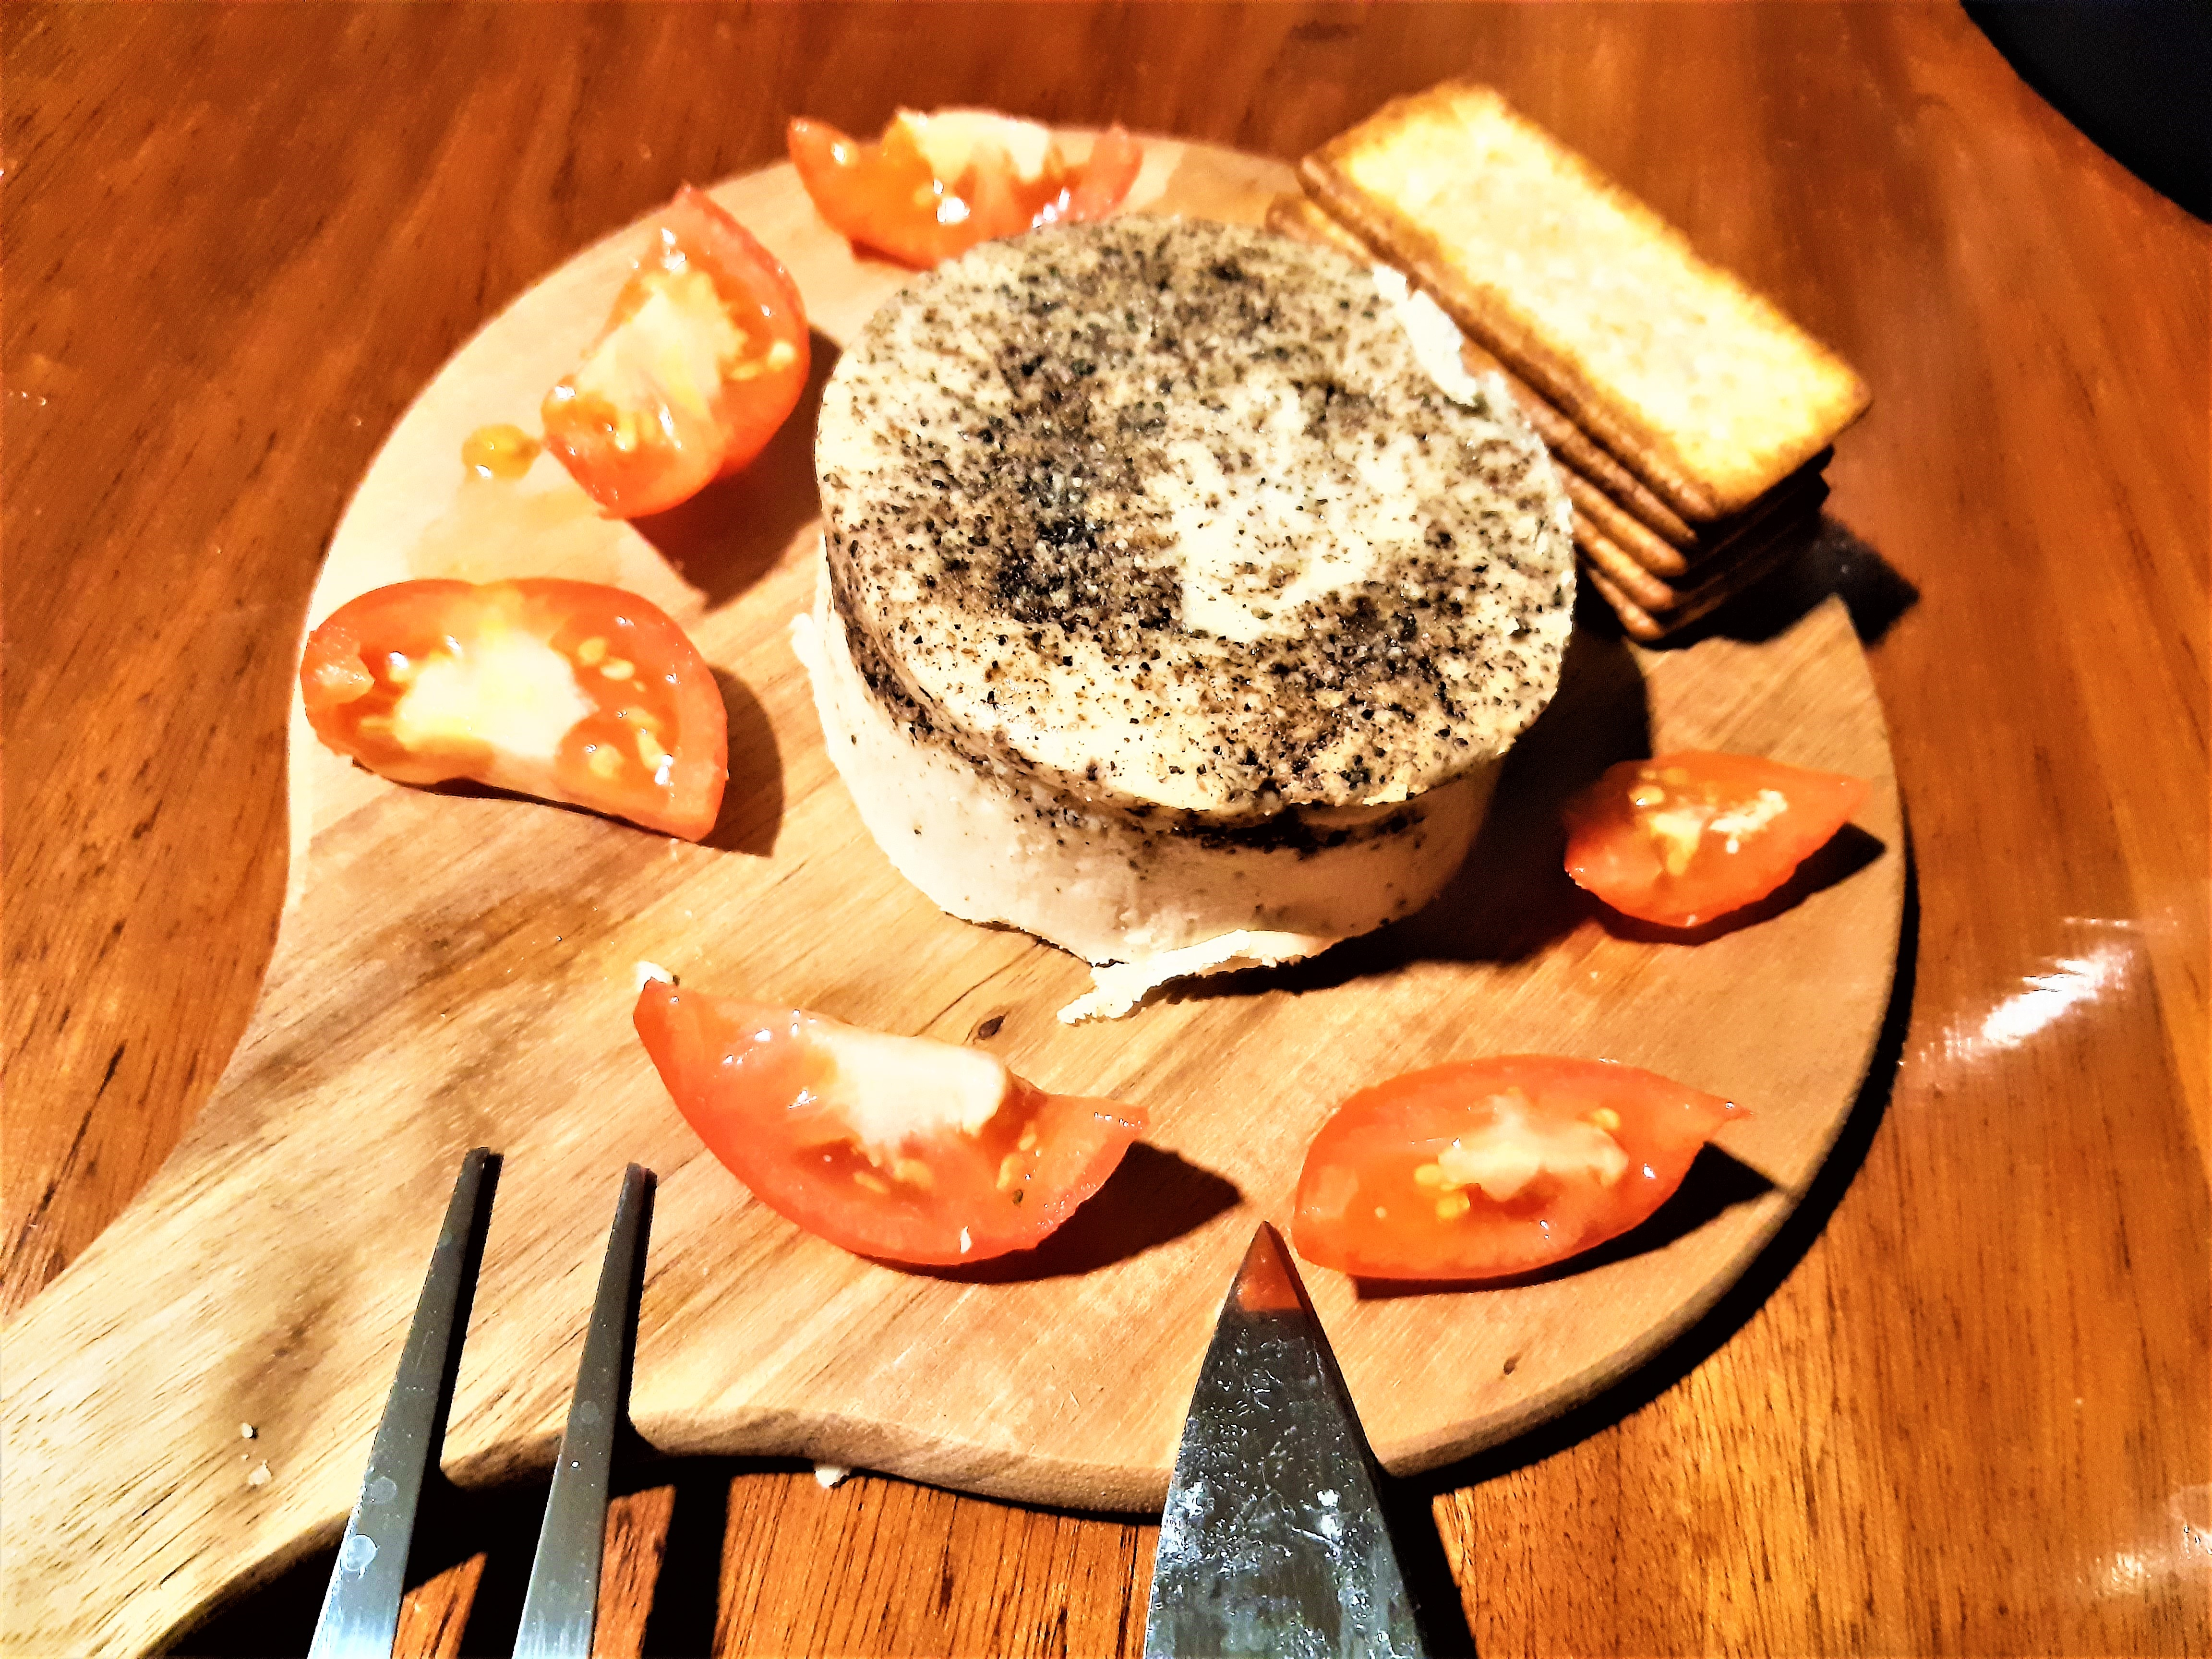 Treeline vegan aged artisinal cheese